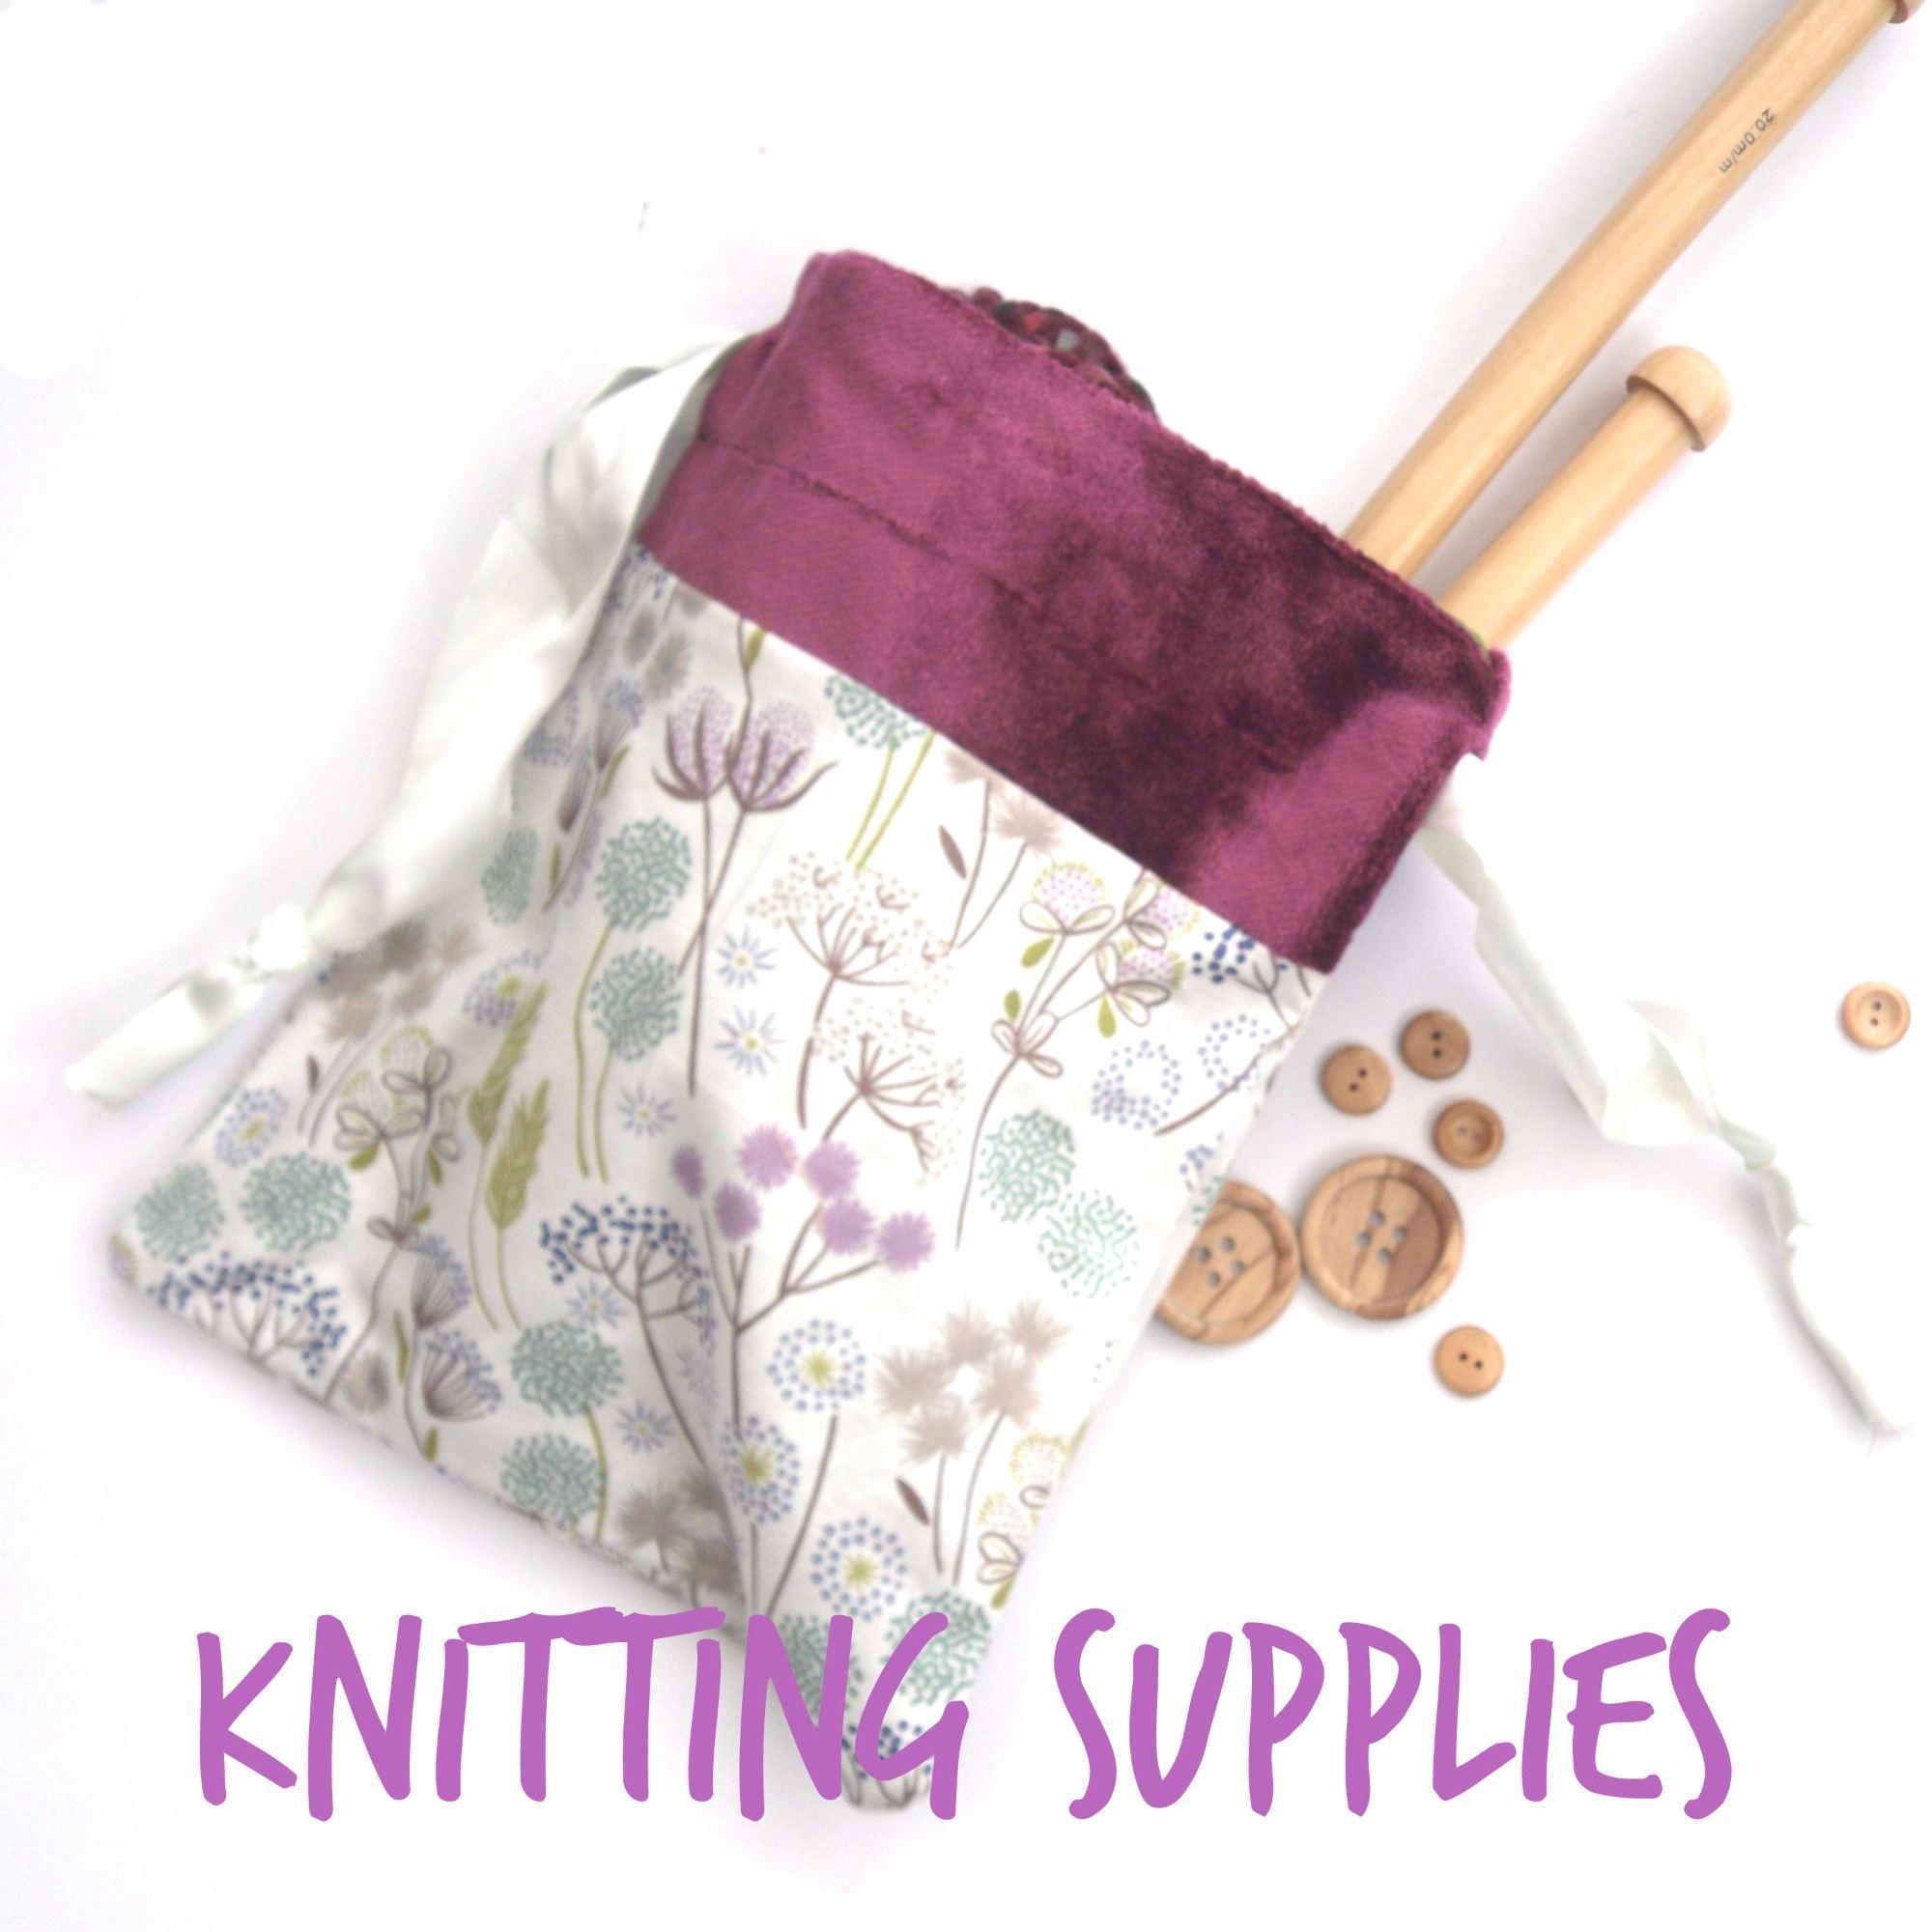 knitting supplies - needles, yarn etc